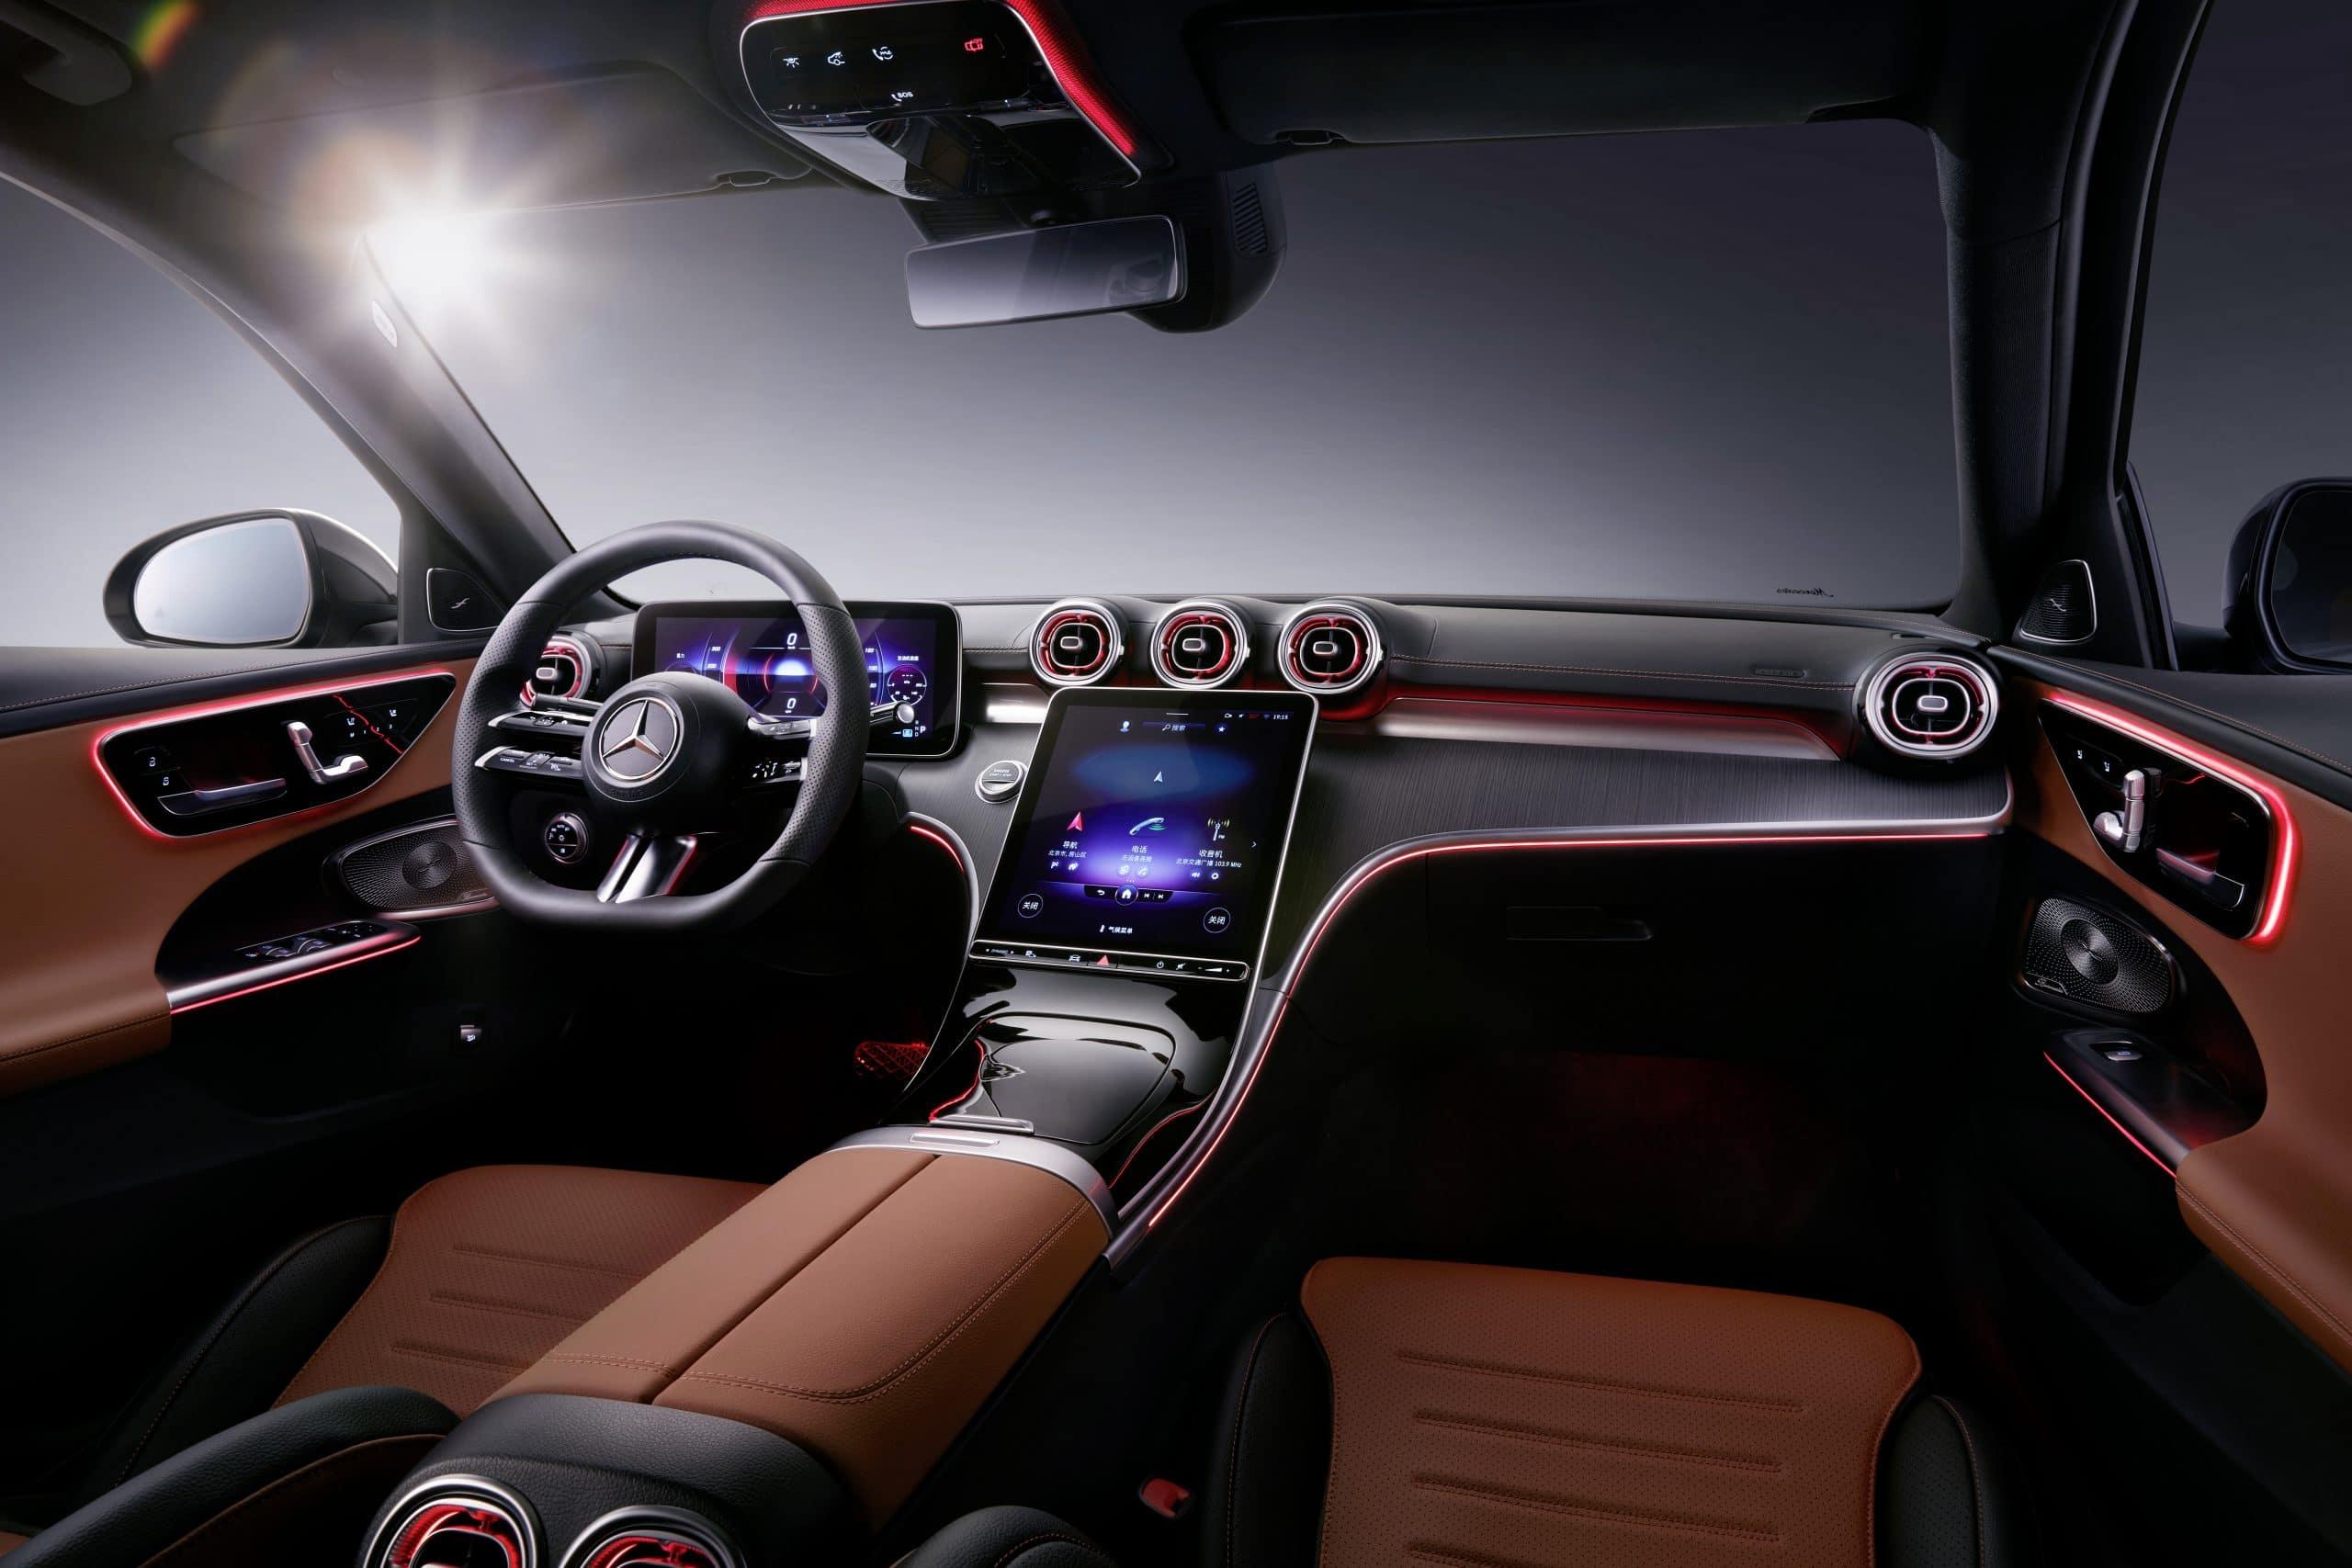 21C0234 004 scaled Η νέα Mercedes-Benz C-Class ήρθε και στην Ελλάδα C Class, Mercedes, Mercedes Benz, Mercedes Benz C Class, Mercedes C Class, zblog, ειδήσεις, Νέα